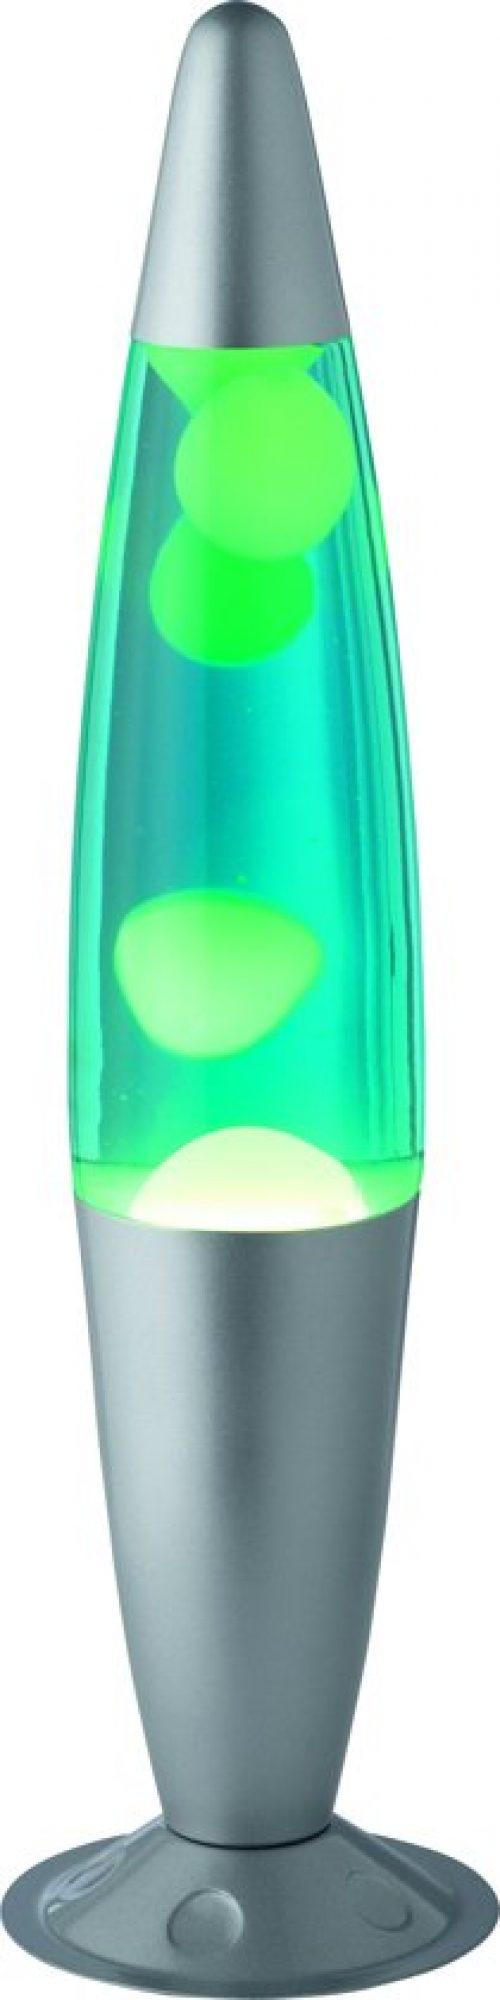 Trio Lighting LAVA - Tafellamp - Halogeen laagspanning - Groen